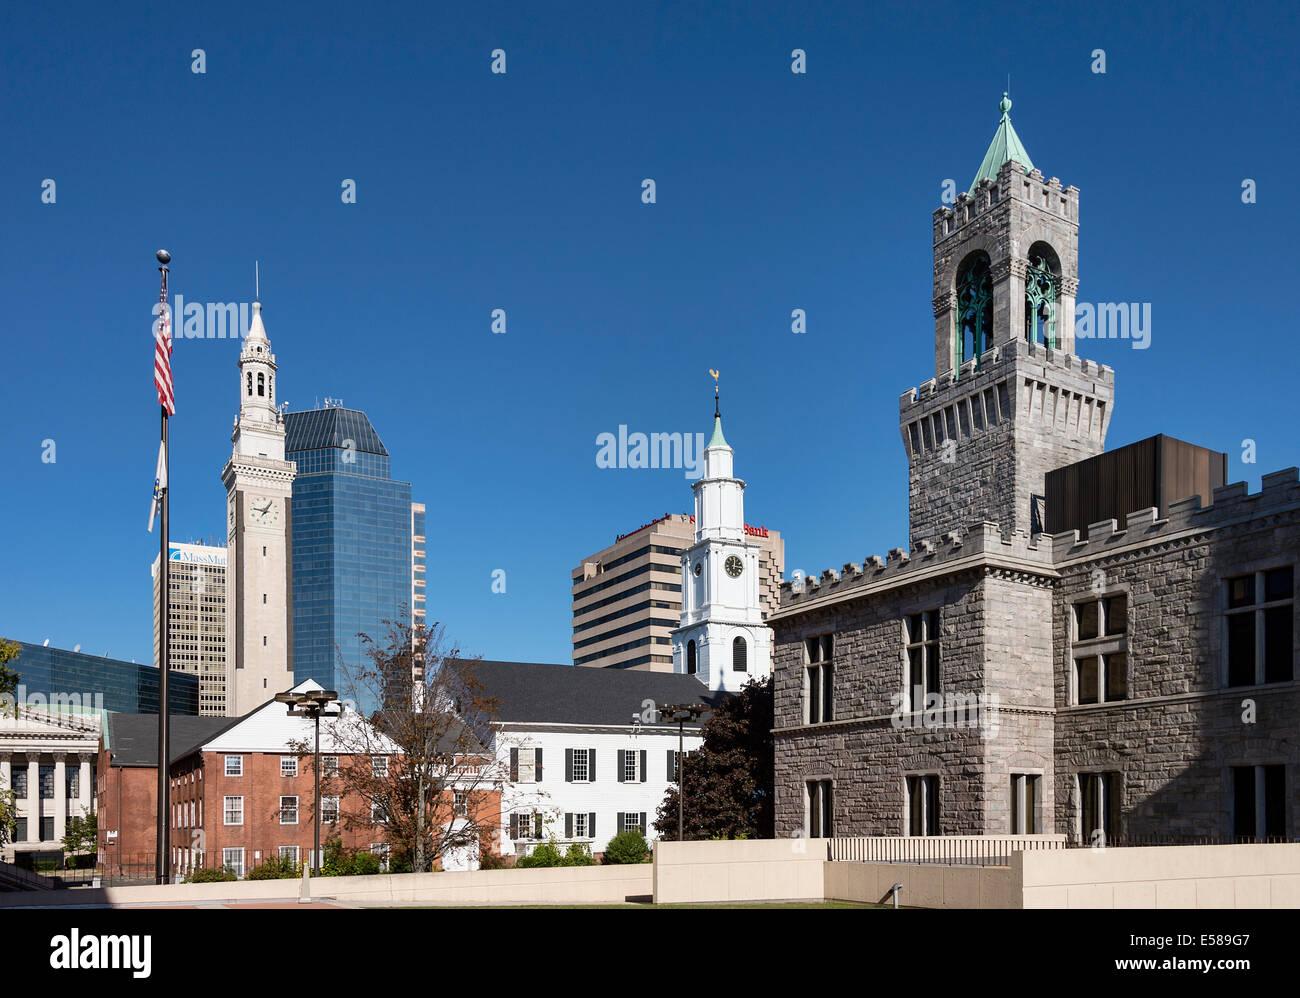 Downtown, Springfield, Massachusetts, USA - Stock Image